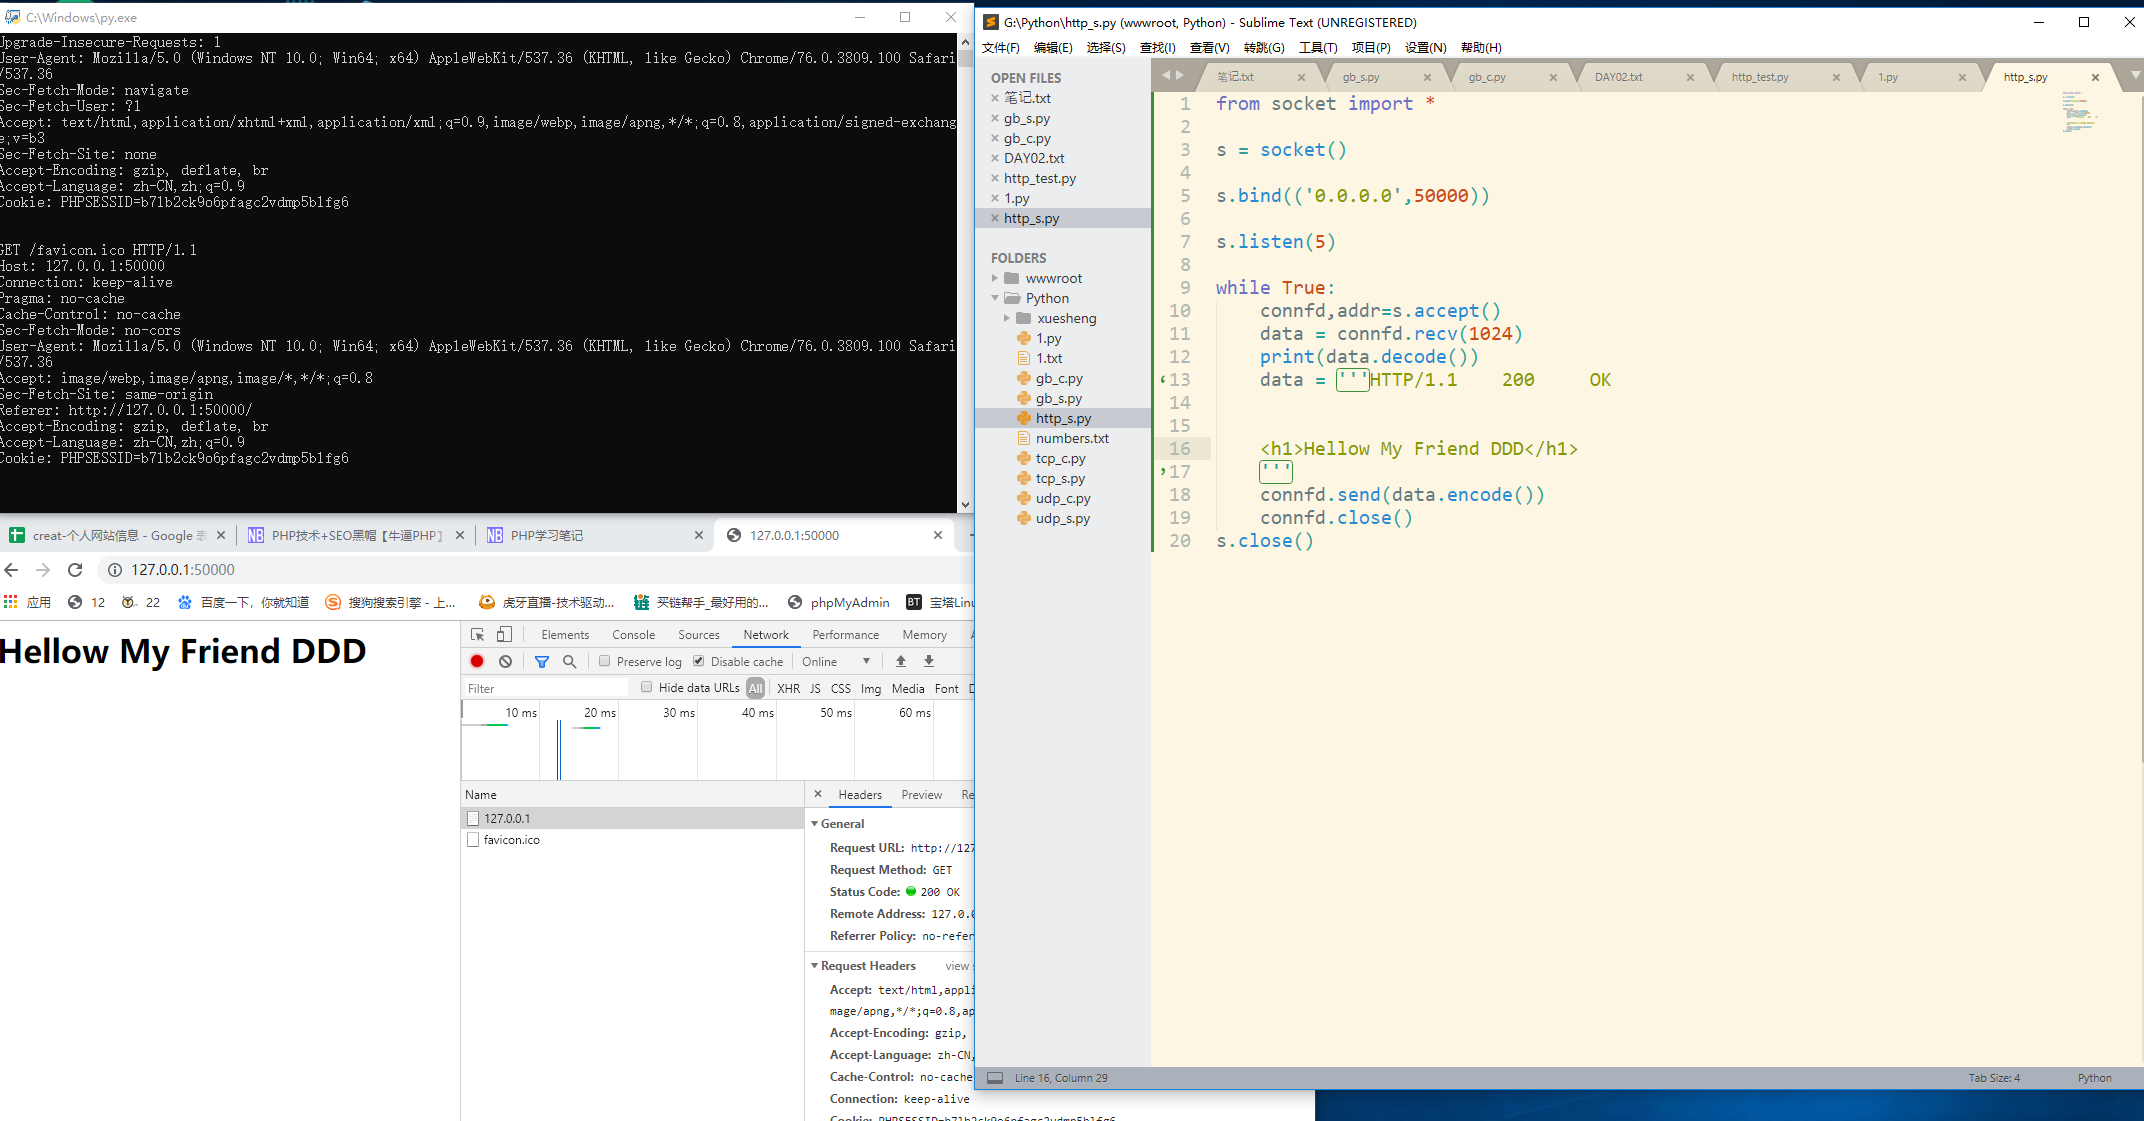 HTTP/1.1    200     OK 为必须,<h1>Hellow My Friend DDD</h1>是返回给浏览器的页面内容,将直接显示在屏幕上,至于请求参数之类的,都可以省略不写